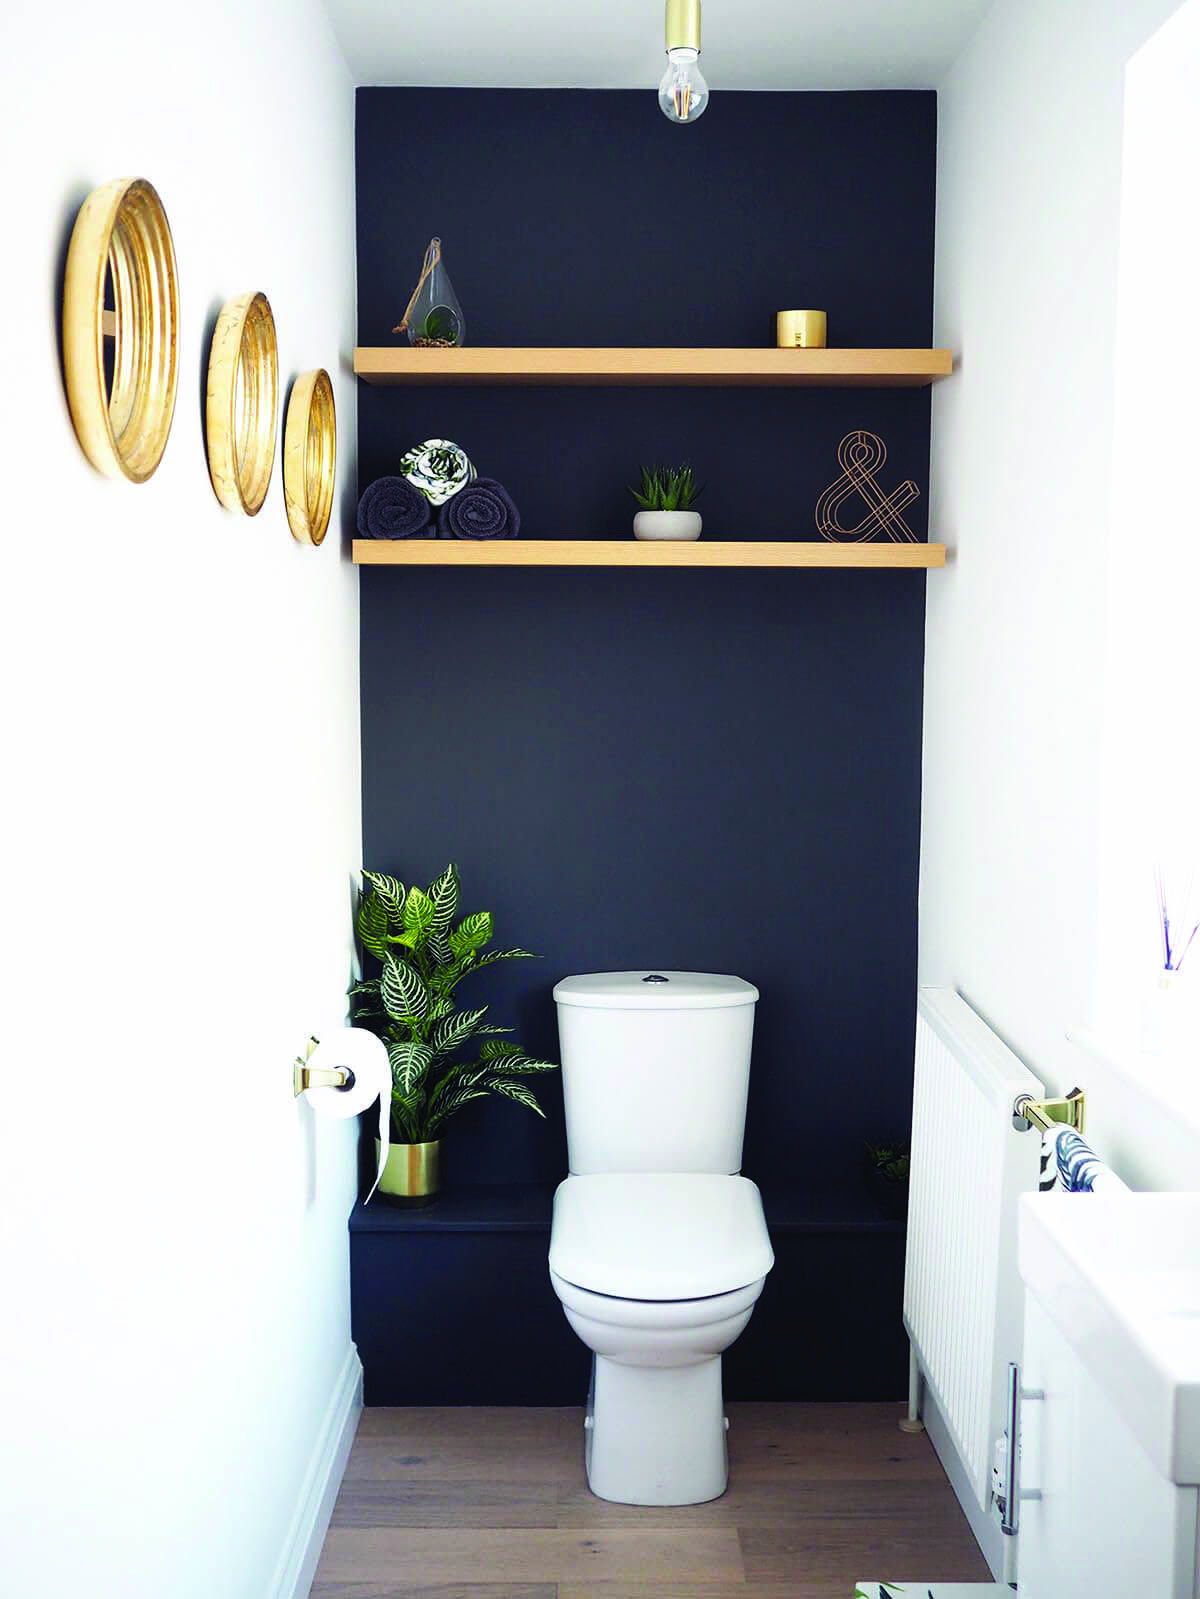 Graceful Burnt Orange Accent Wall Ideas That Look Beautiful Bathroom Decor Luxury Modern Powder Rooms Powder Room Small